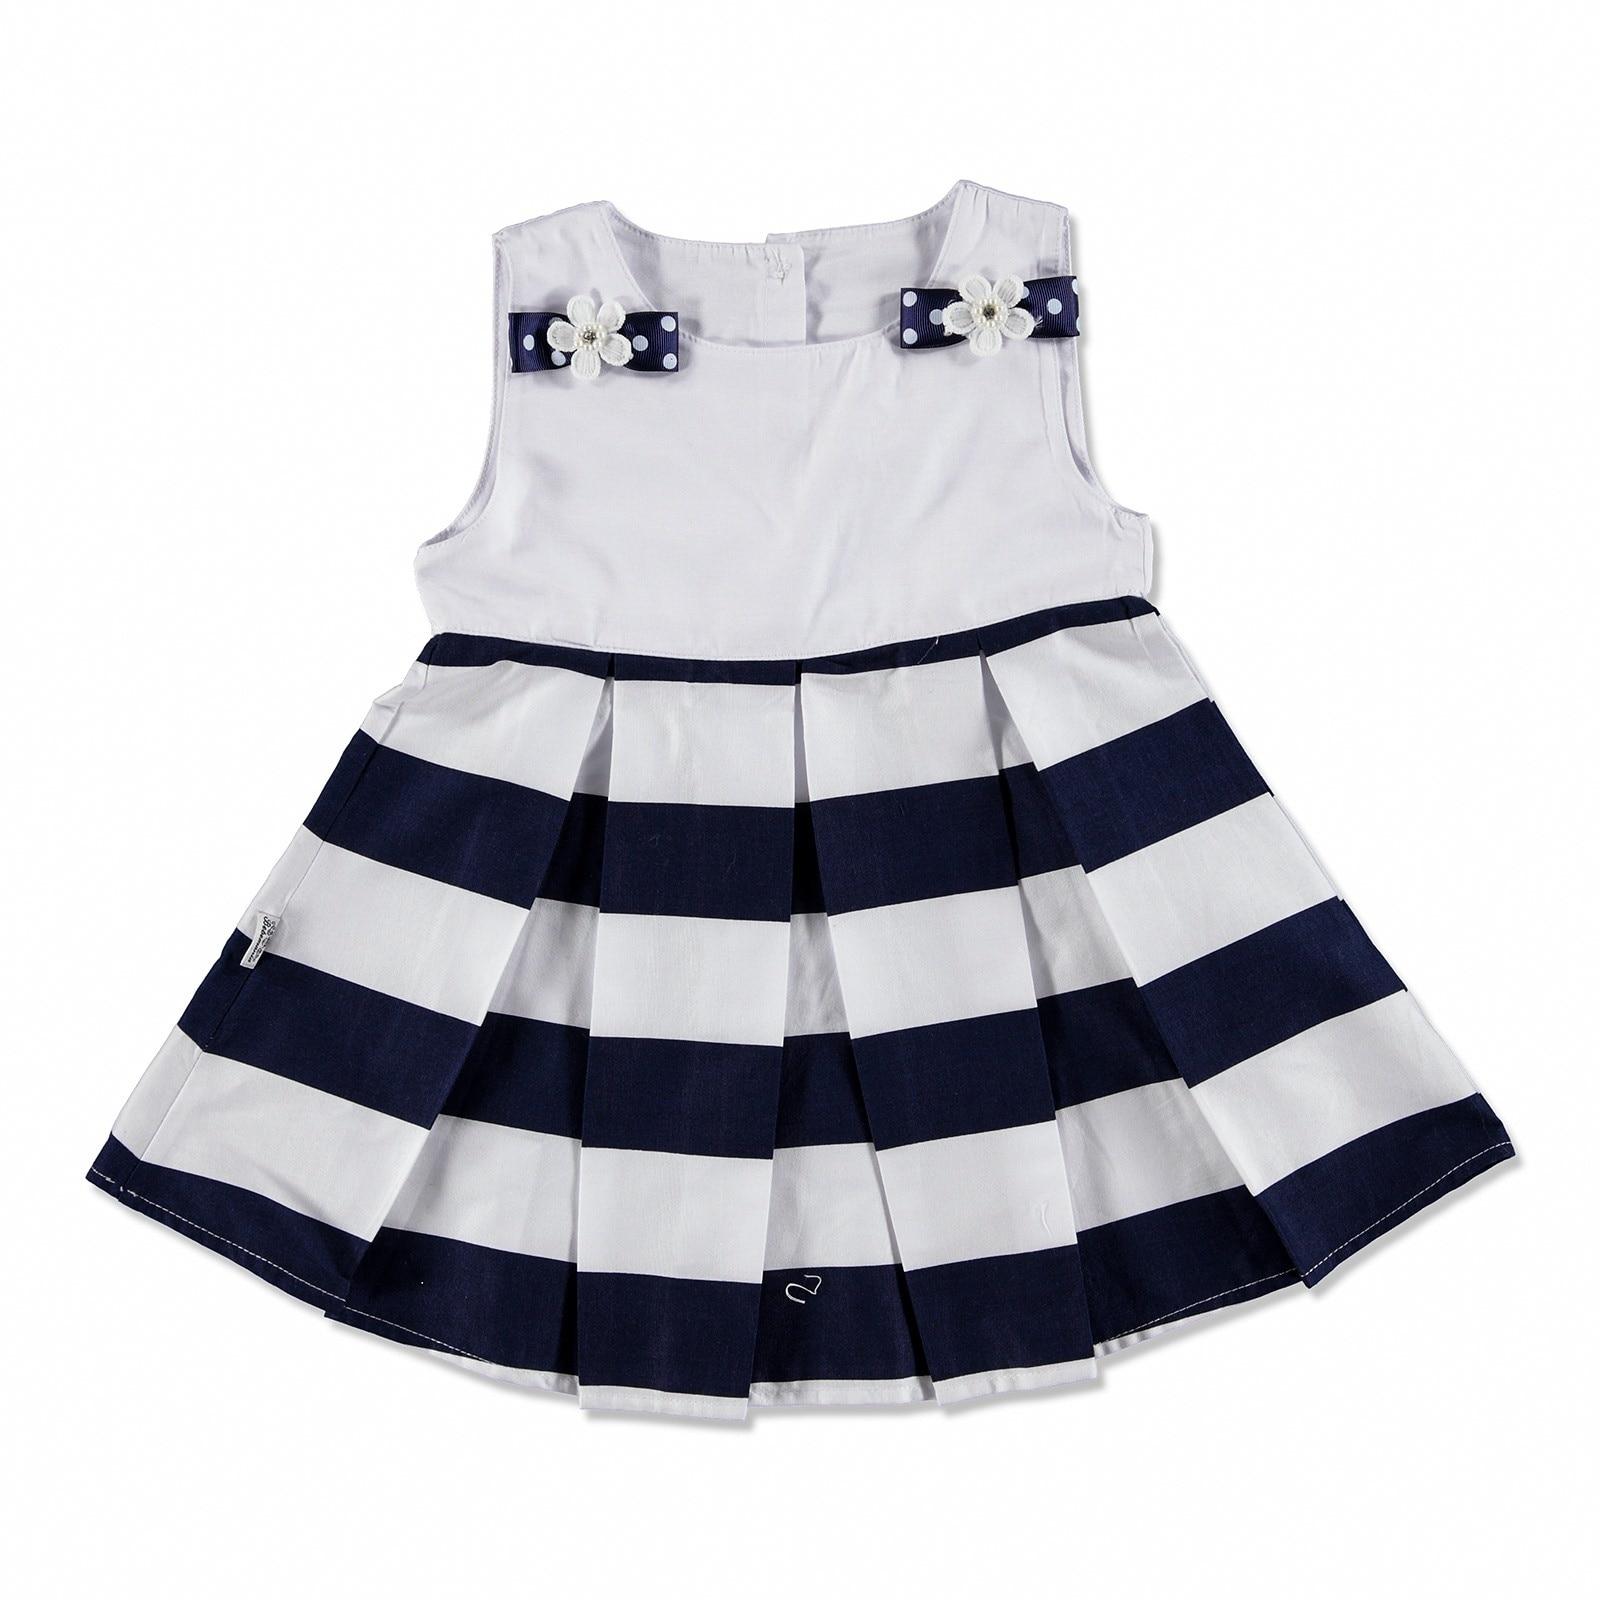 Ebebek Bebemania Summer Baby Girl Chic Blue Dress